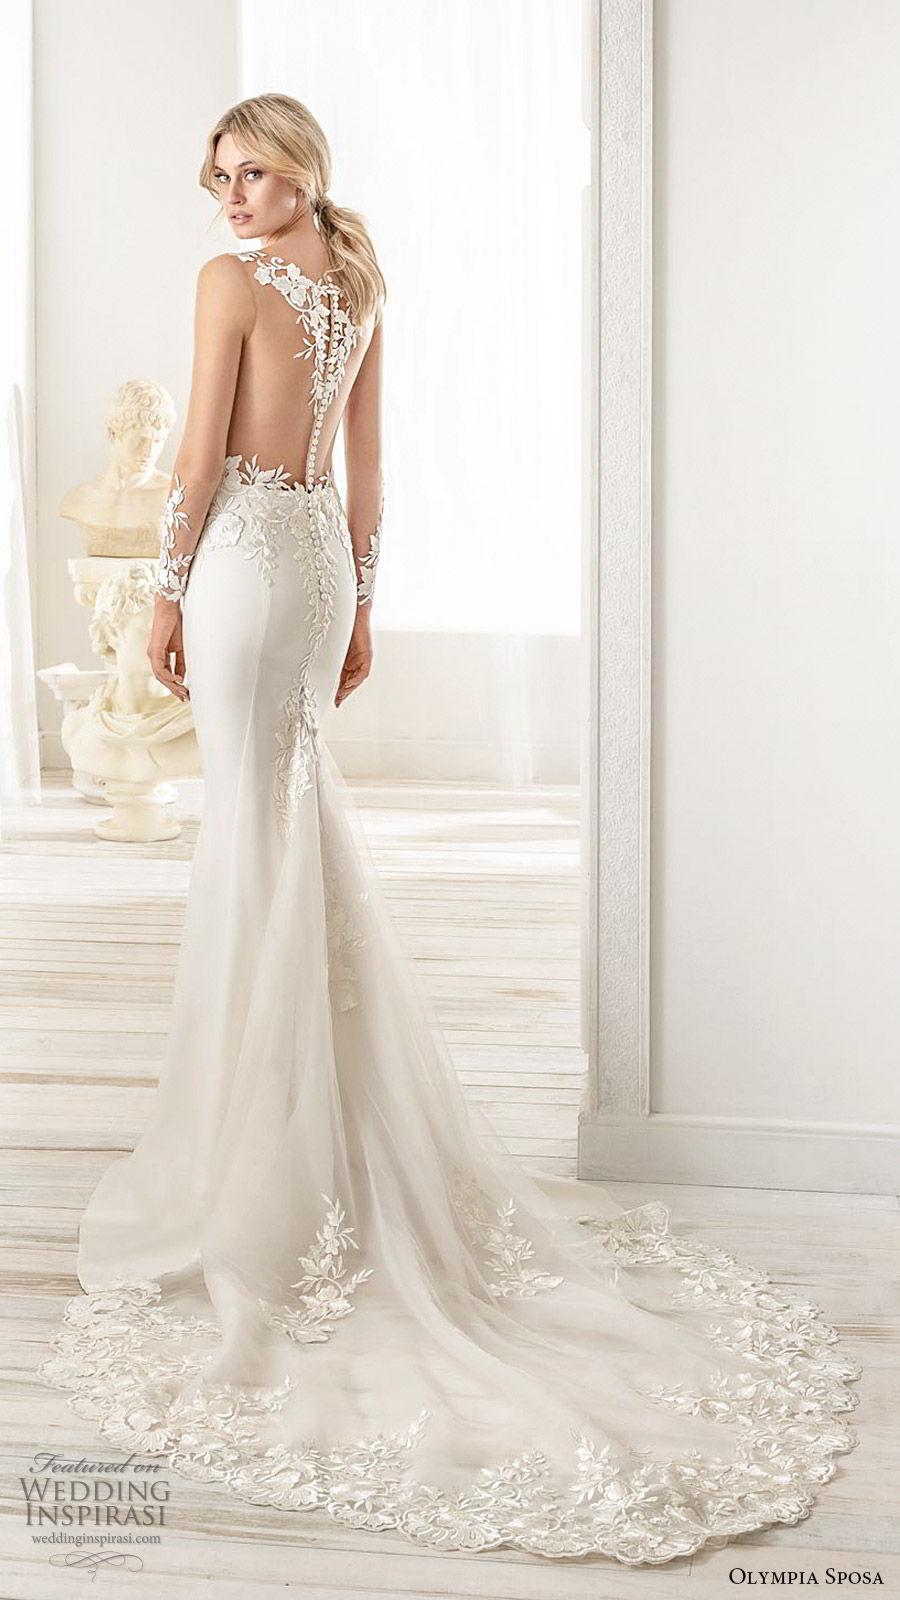 olympia sposa 2020 bridal illusion long sleeves v neckline sheer embellished bodice fit flare trumpet mermaid wedding dress (15) elegant sexy illusion back chapel train bv